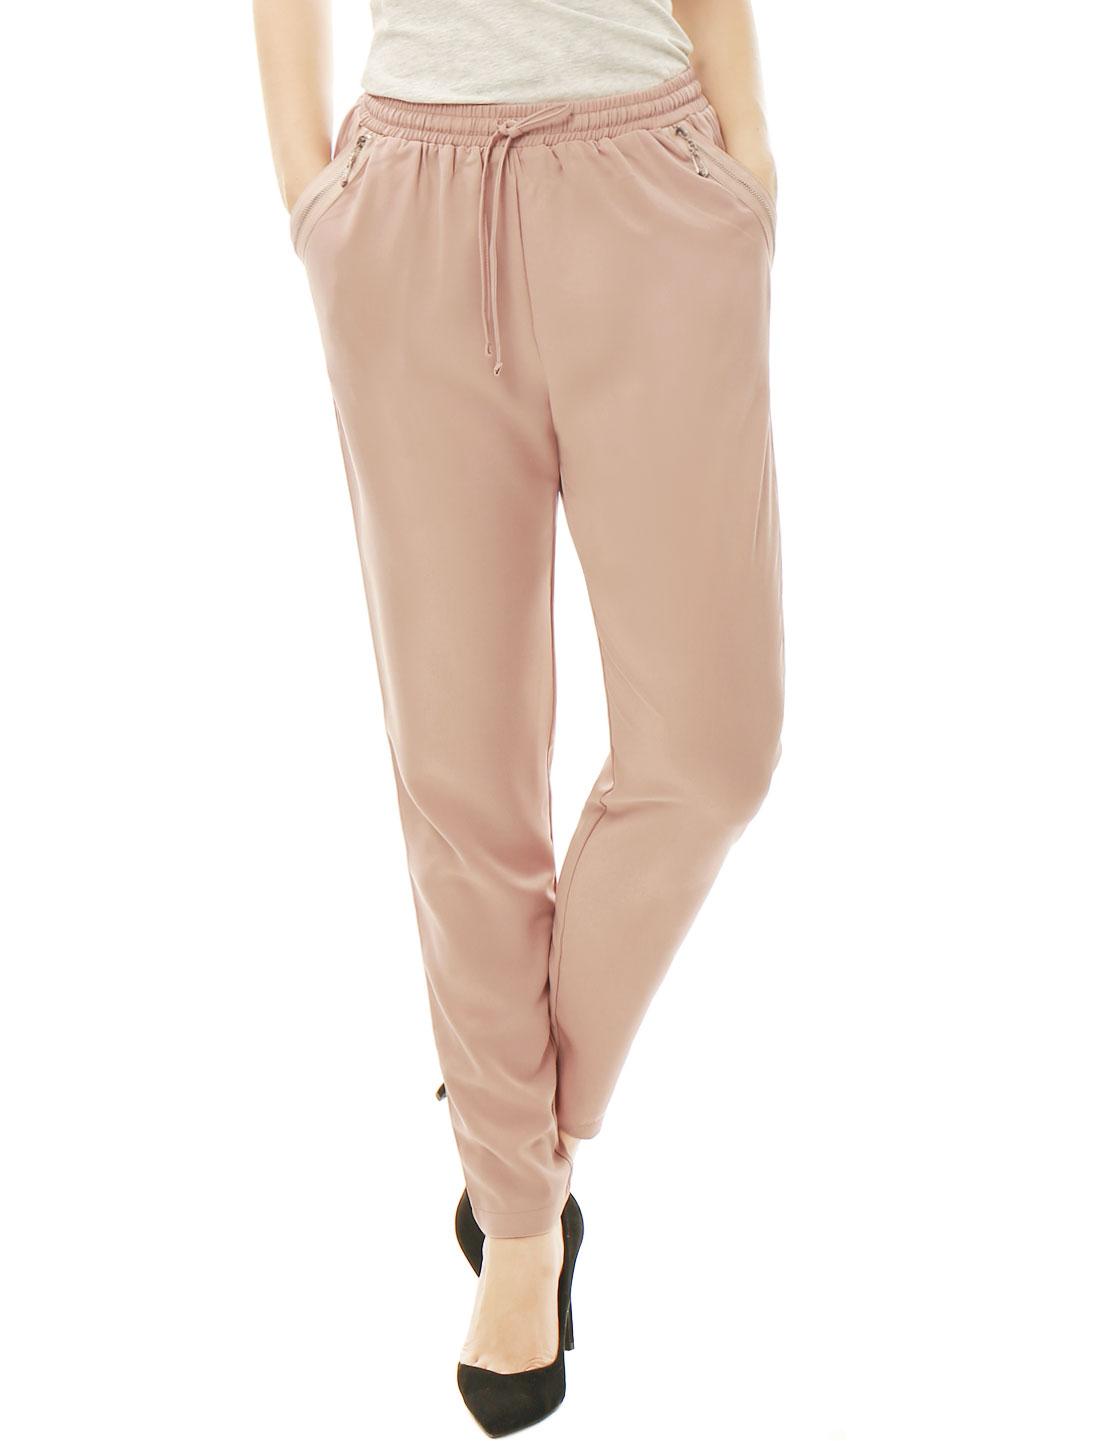 Women Drawstring Elastic Waist Slant Pockets Pants Pink XS